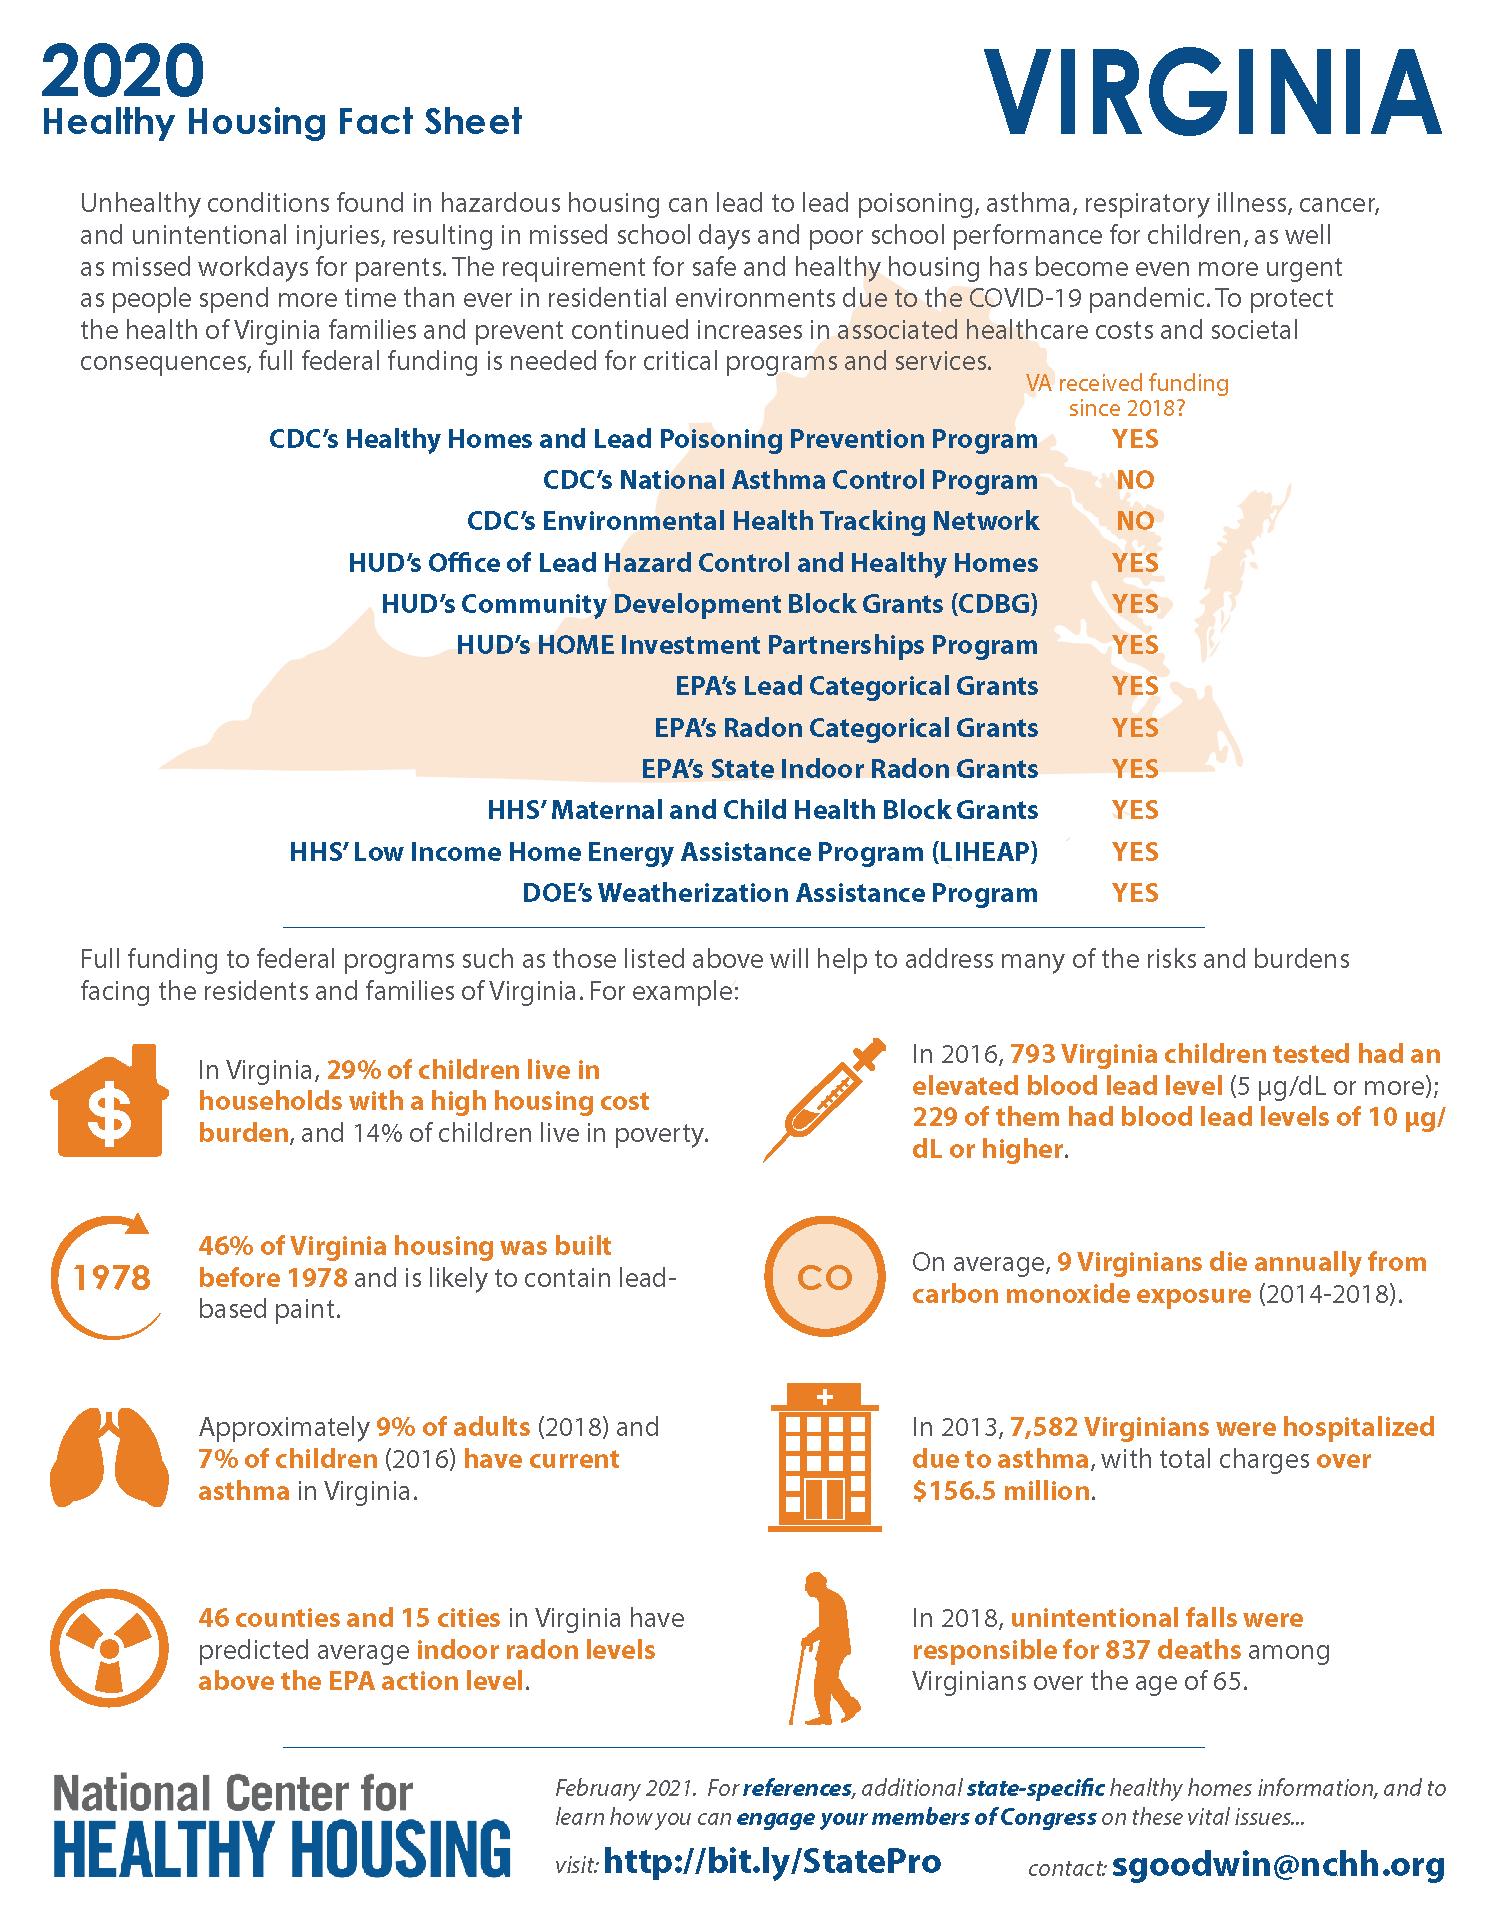 Healthy Housing Fact Sheet - Virginia 2020